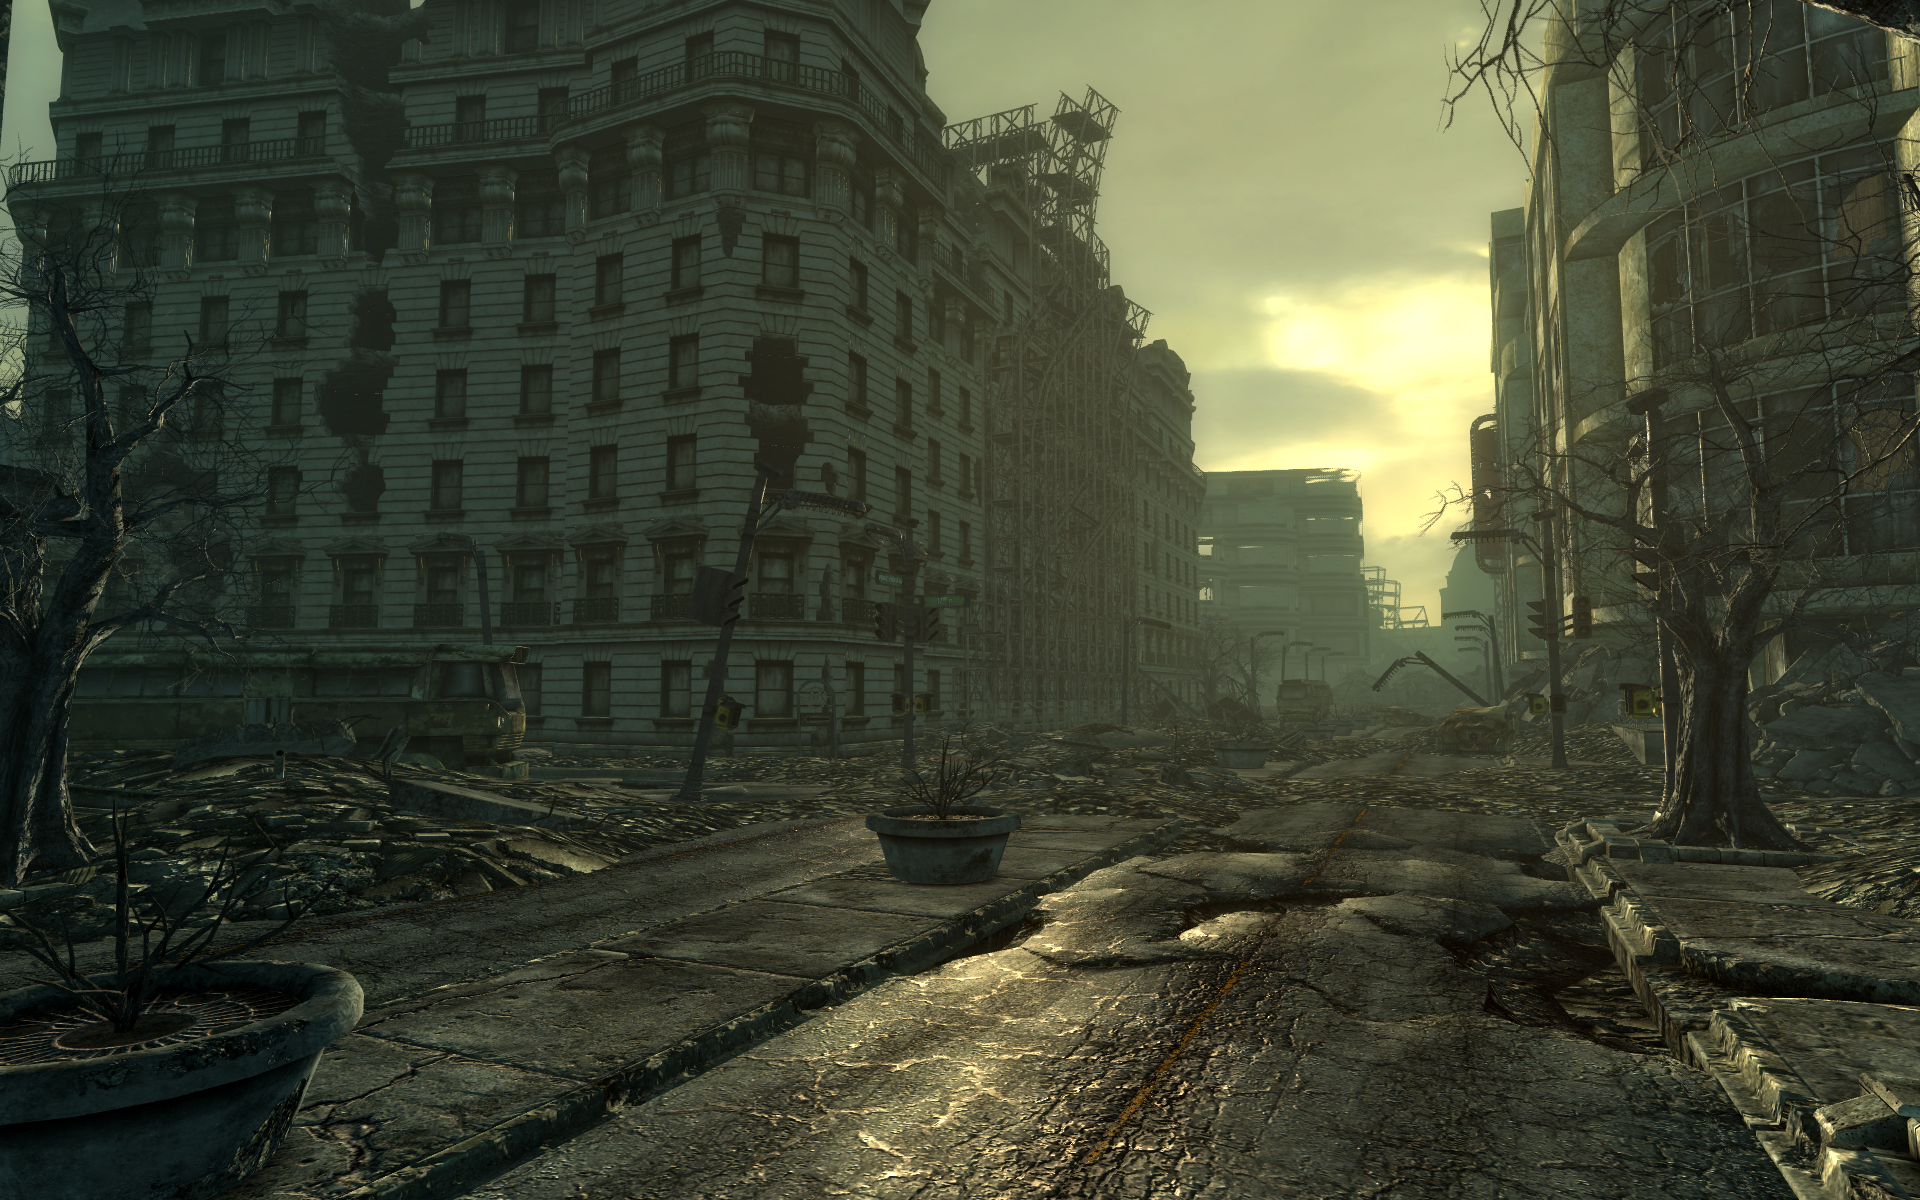 fallout 3 how to take screenshots